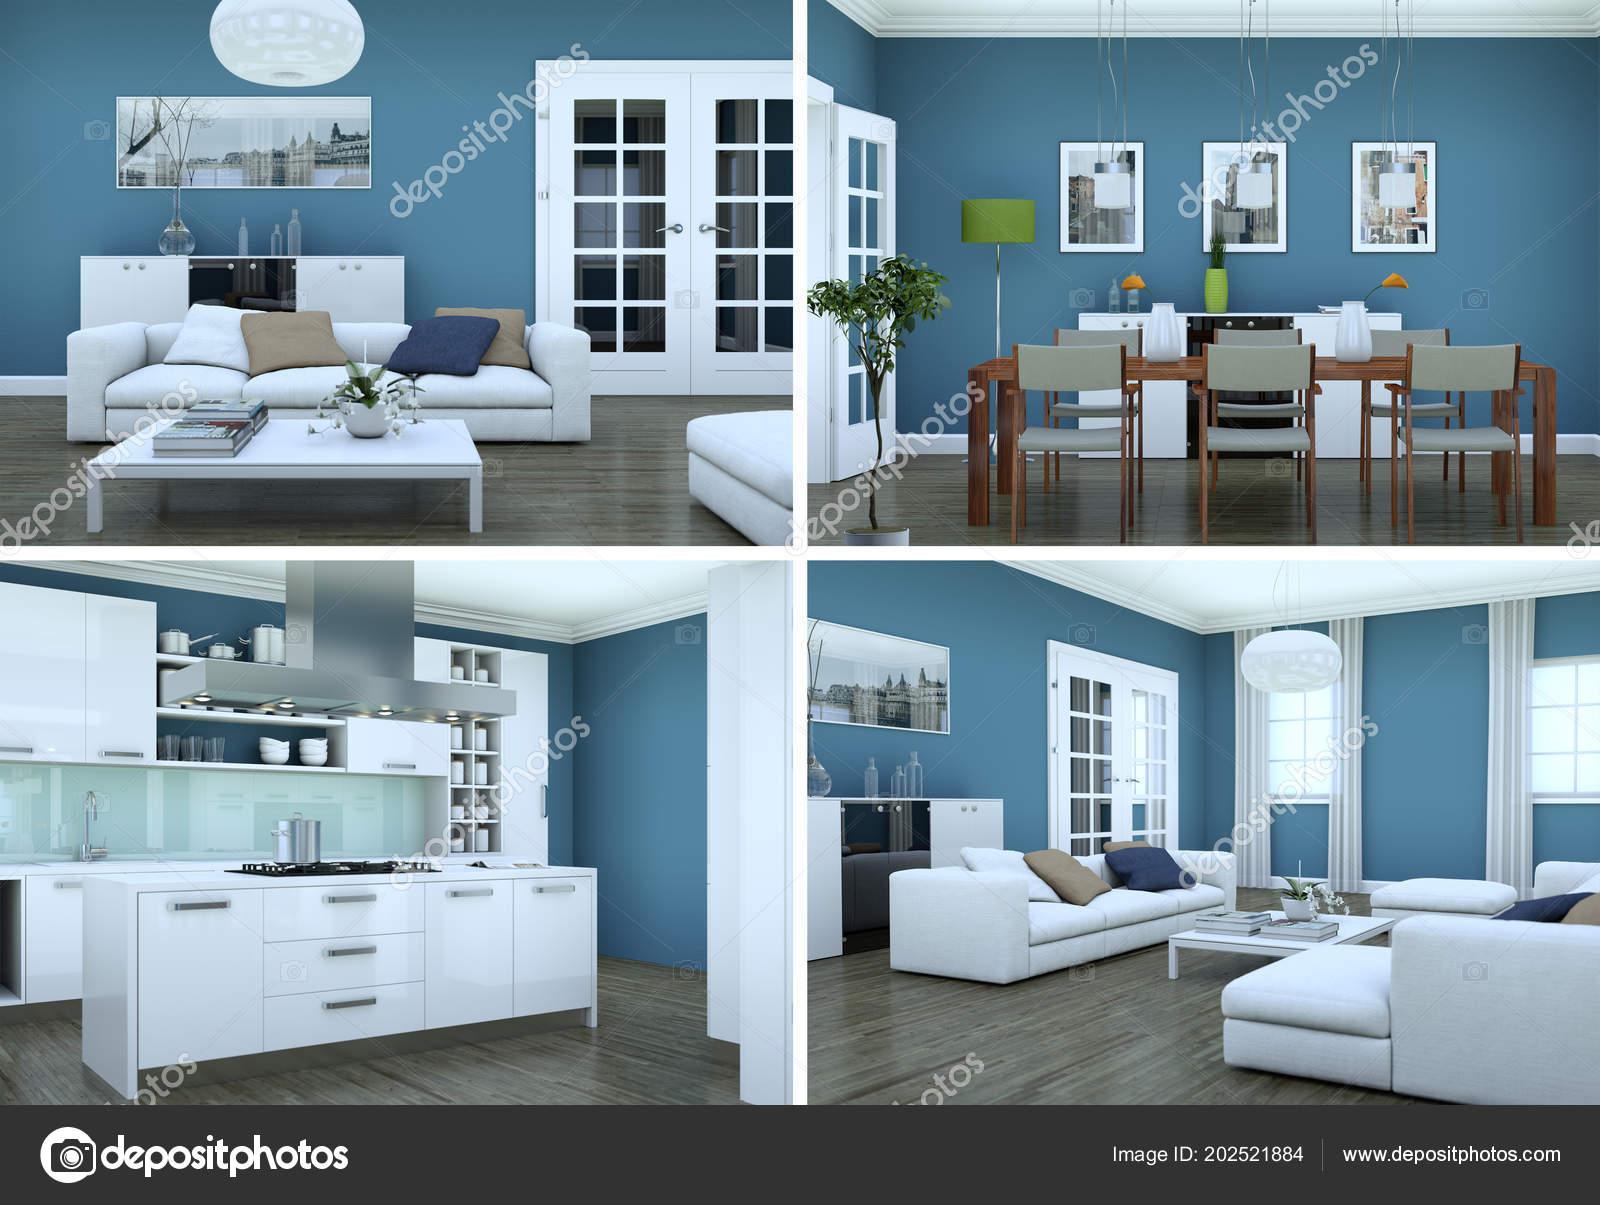 Modern minimalist interior design ideas for your loft conversion